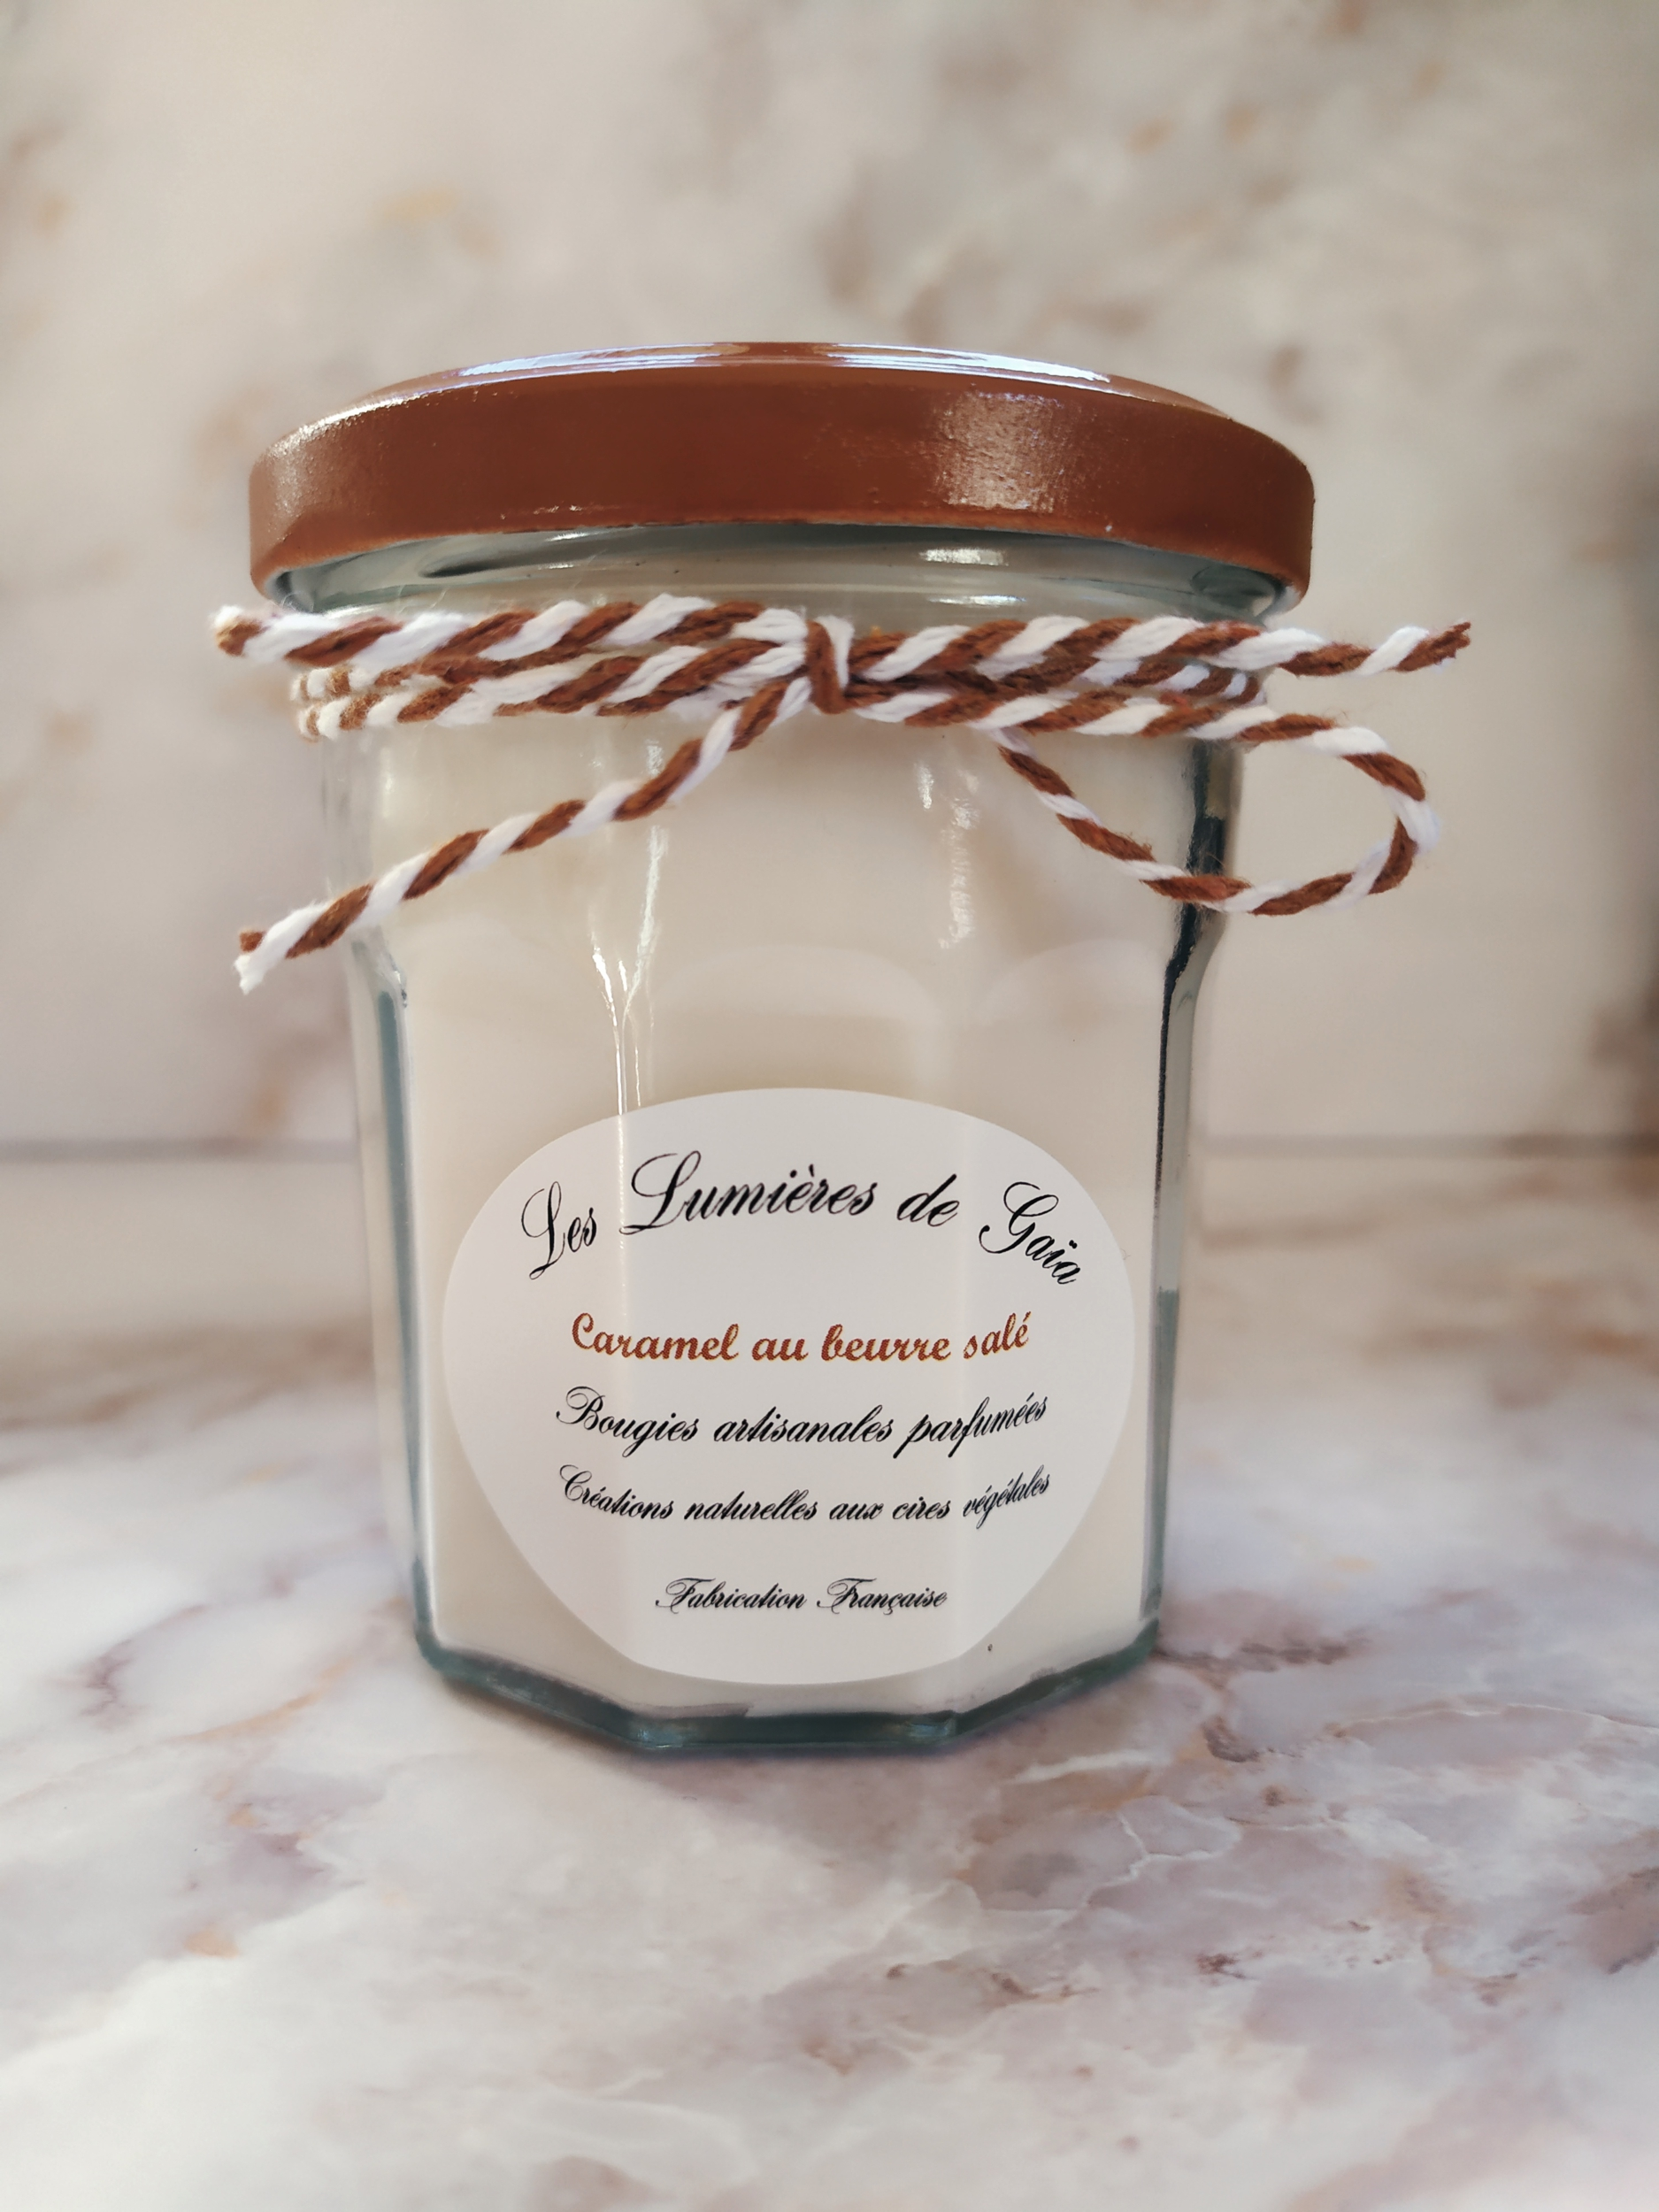 Bougie parfumées Caramel au Beurre salé petite